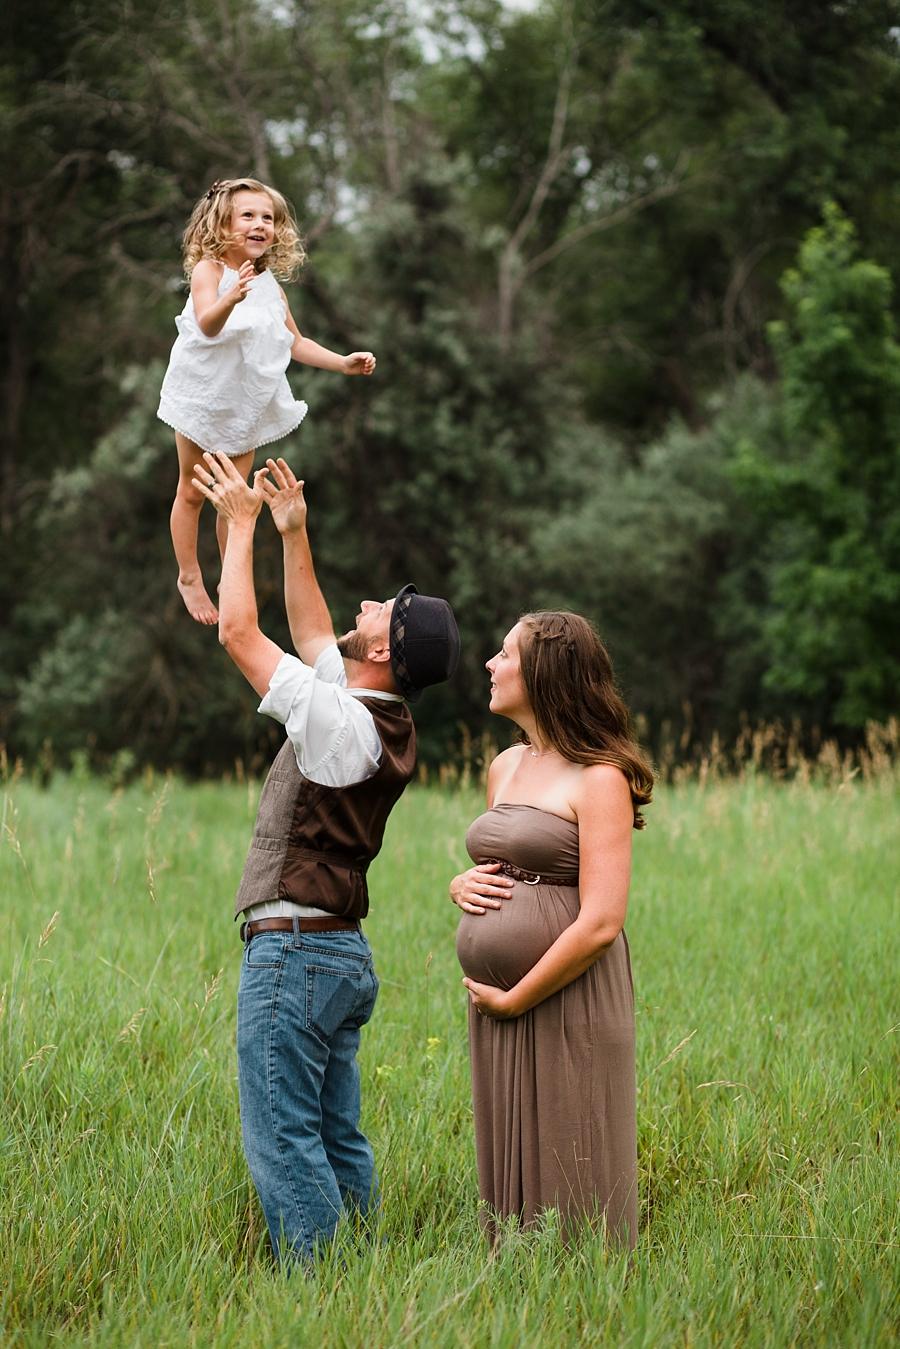 20150721MaternityHolmesLauren033_fort collins maternity photographer.jpg